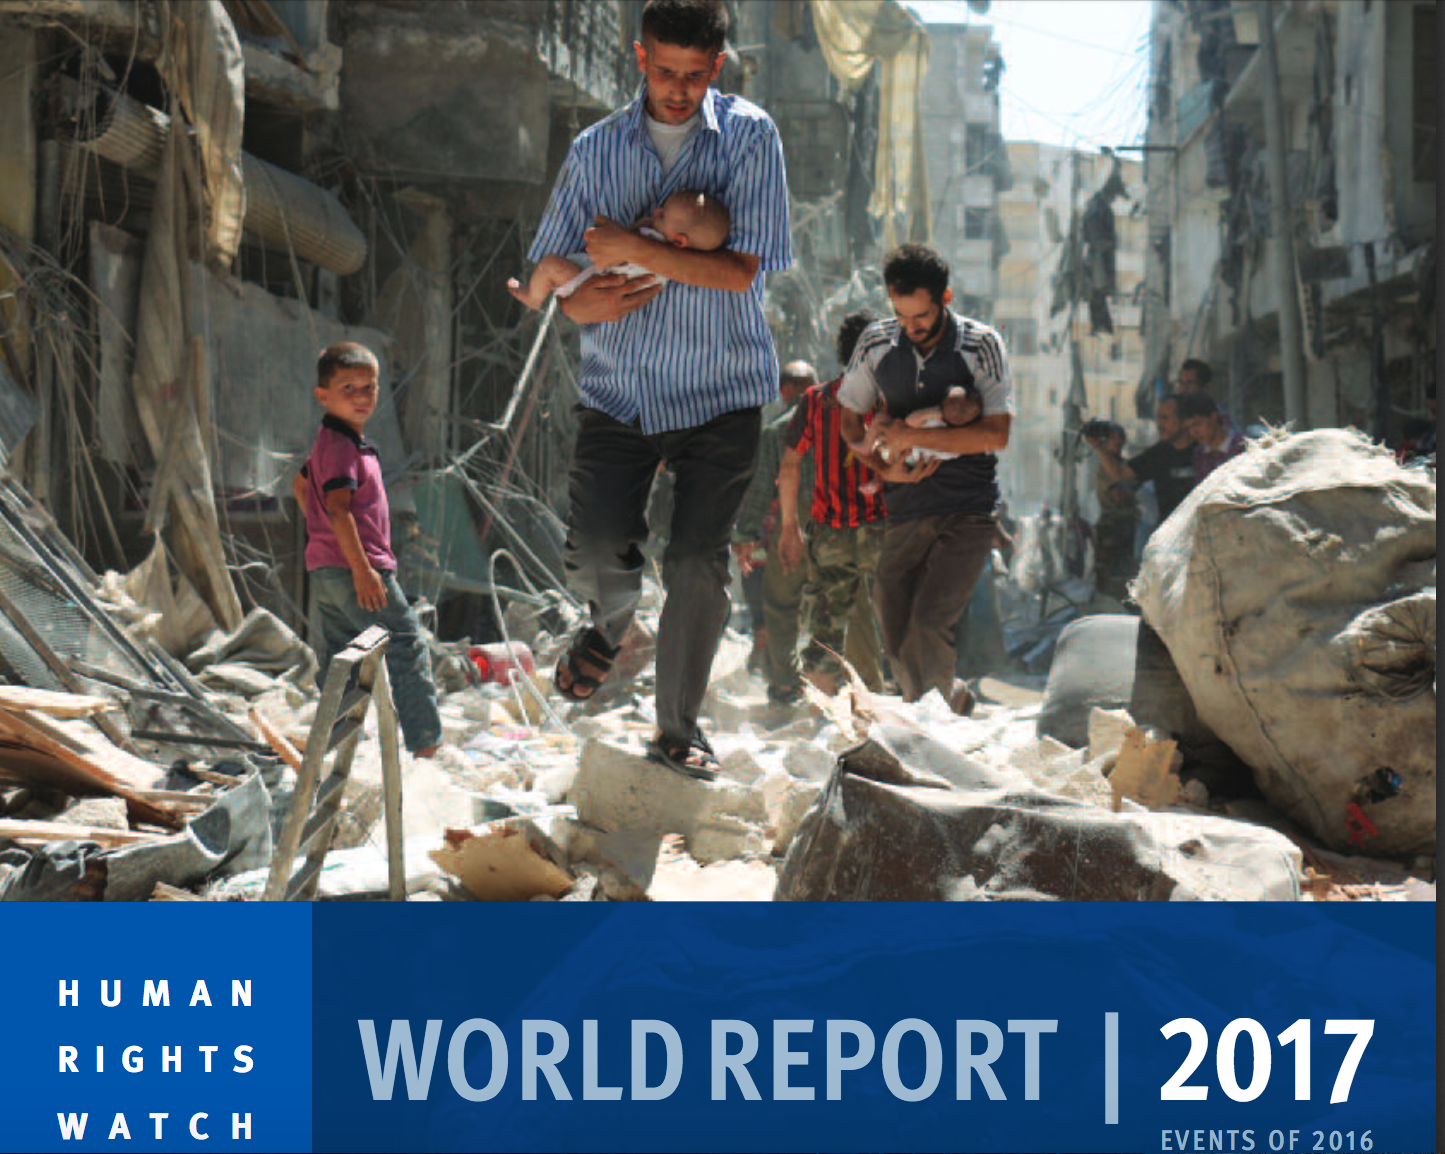 Human Rights Watch: diritti umani, la minaccia populista